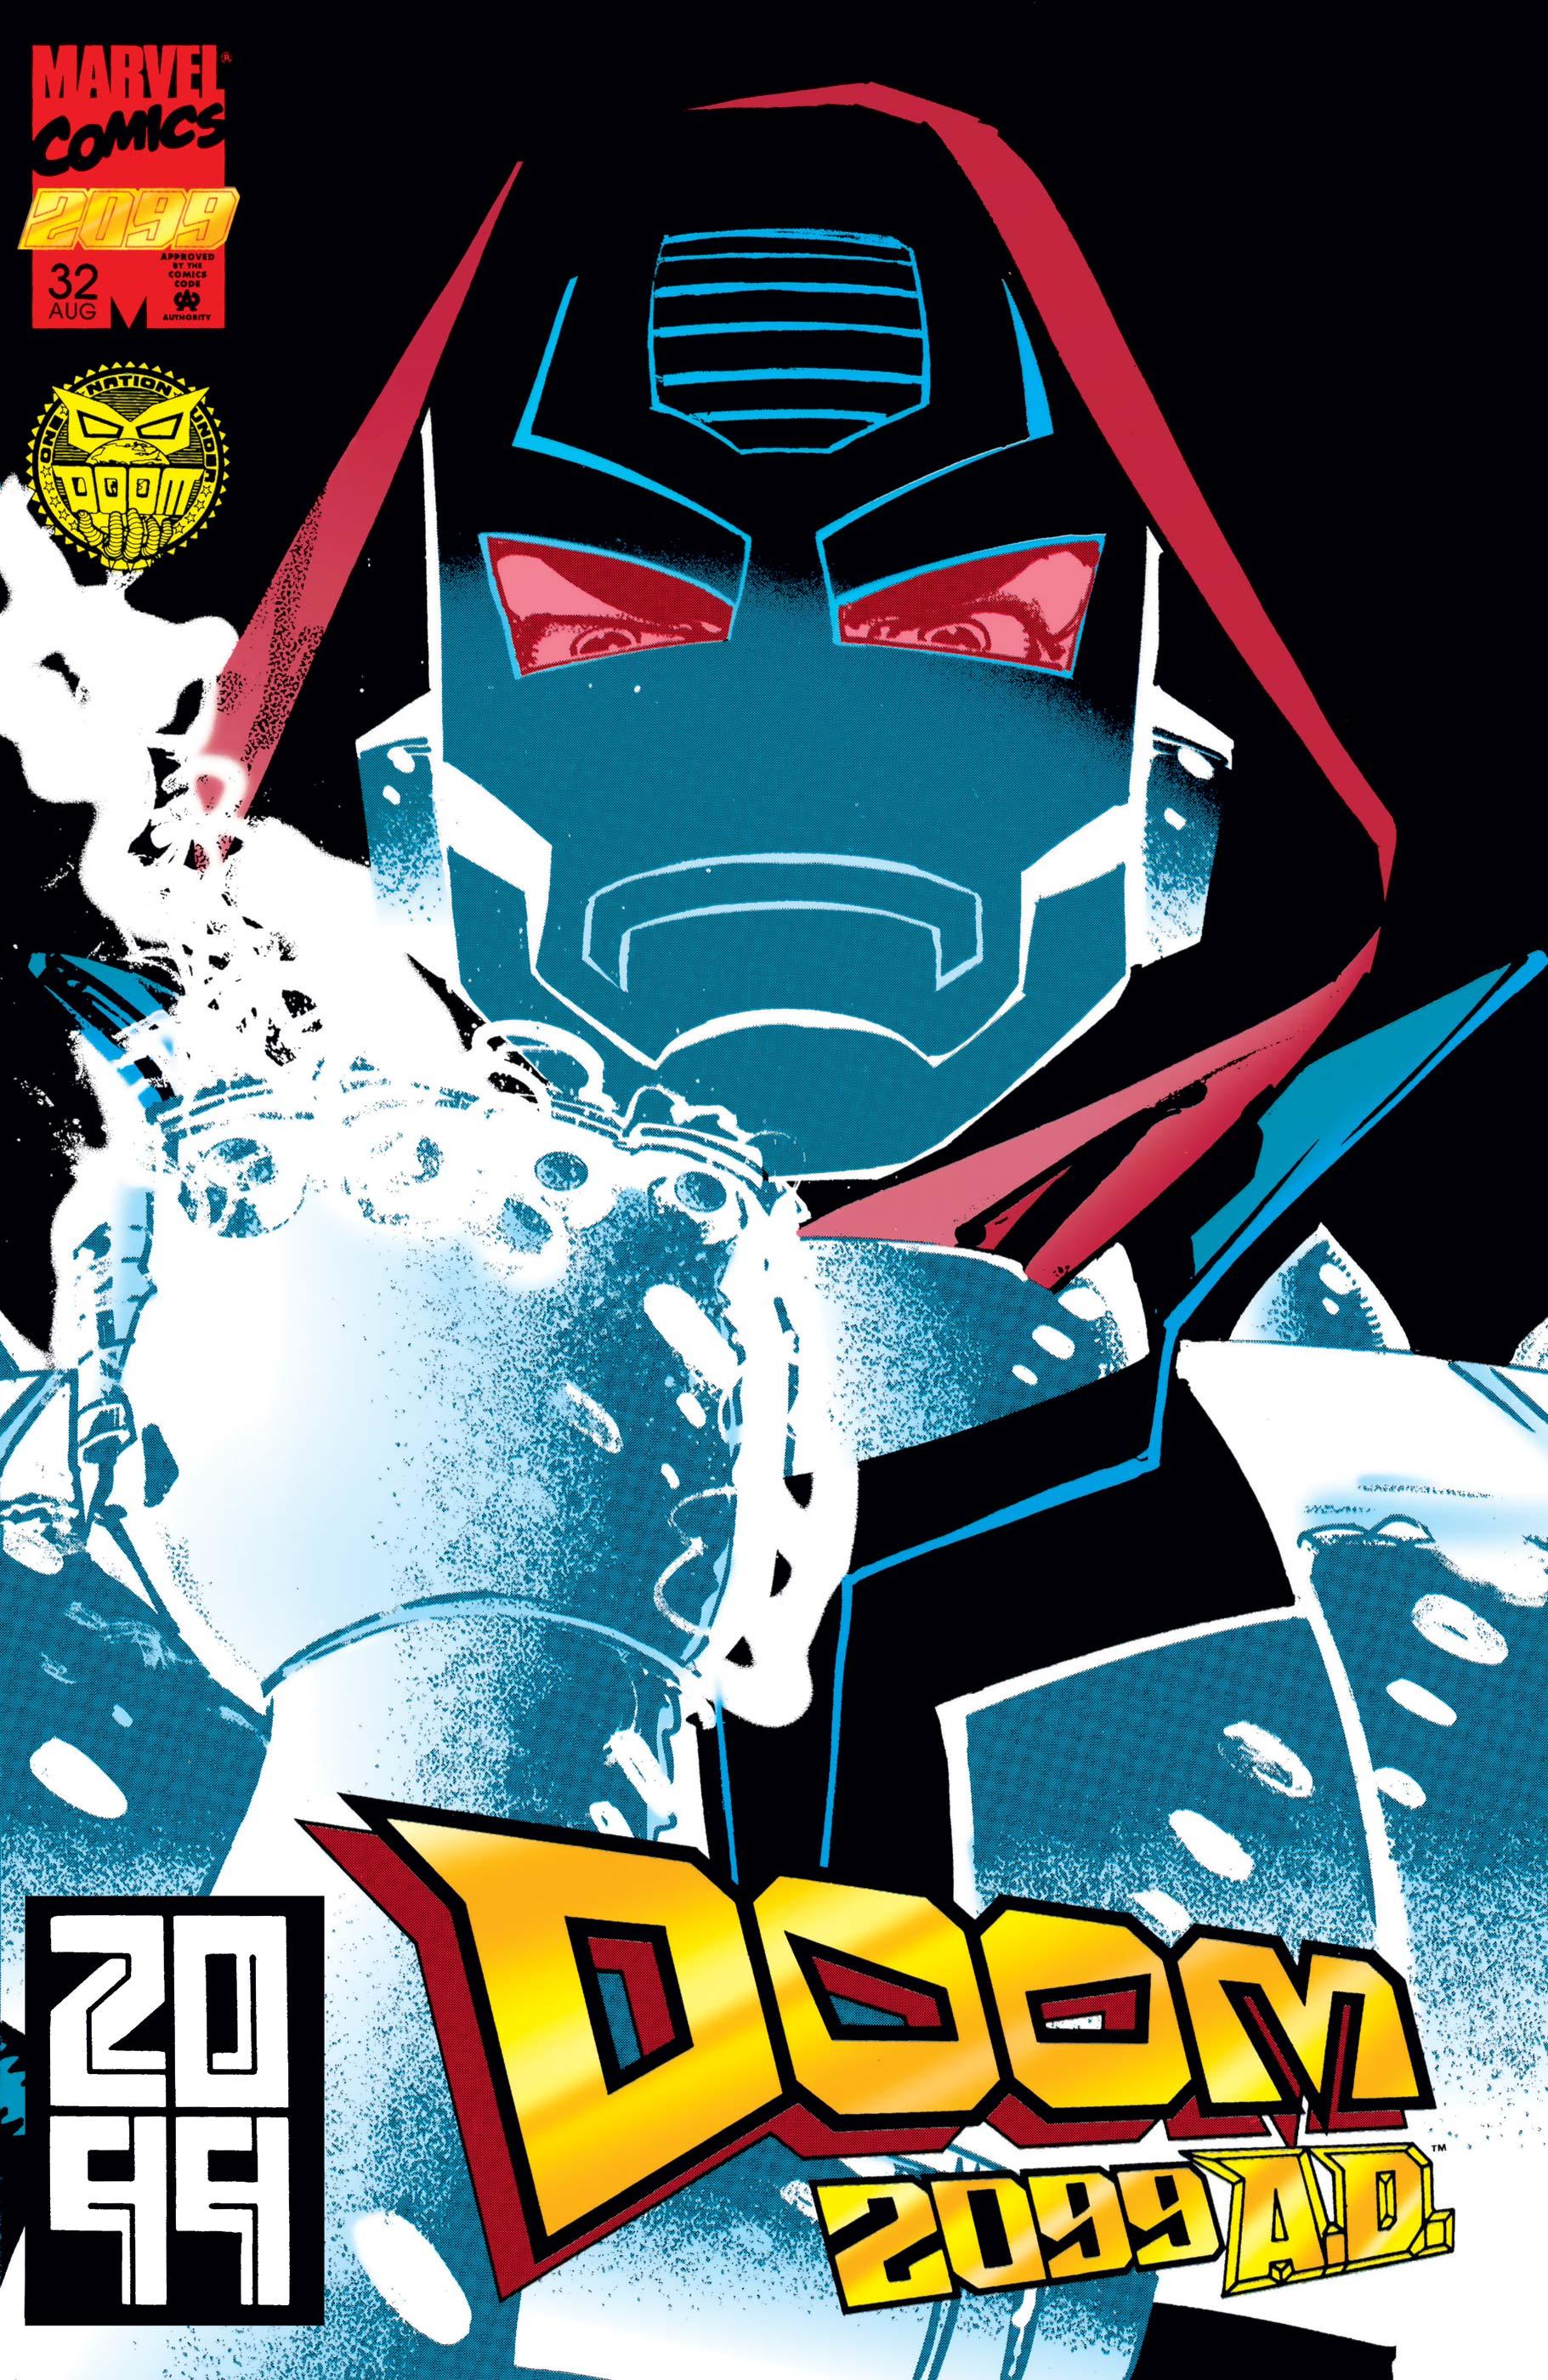 Doom 2099 (1993) #32